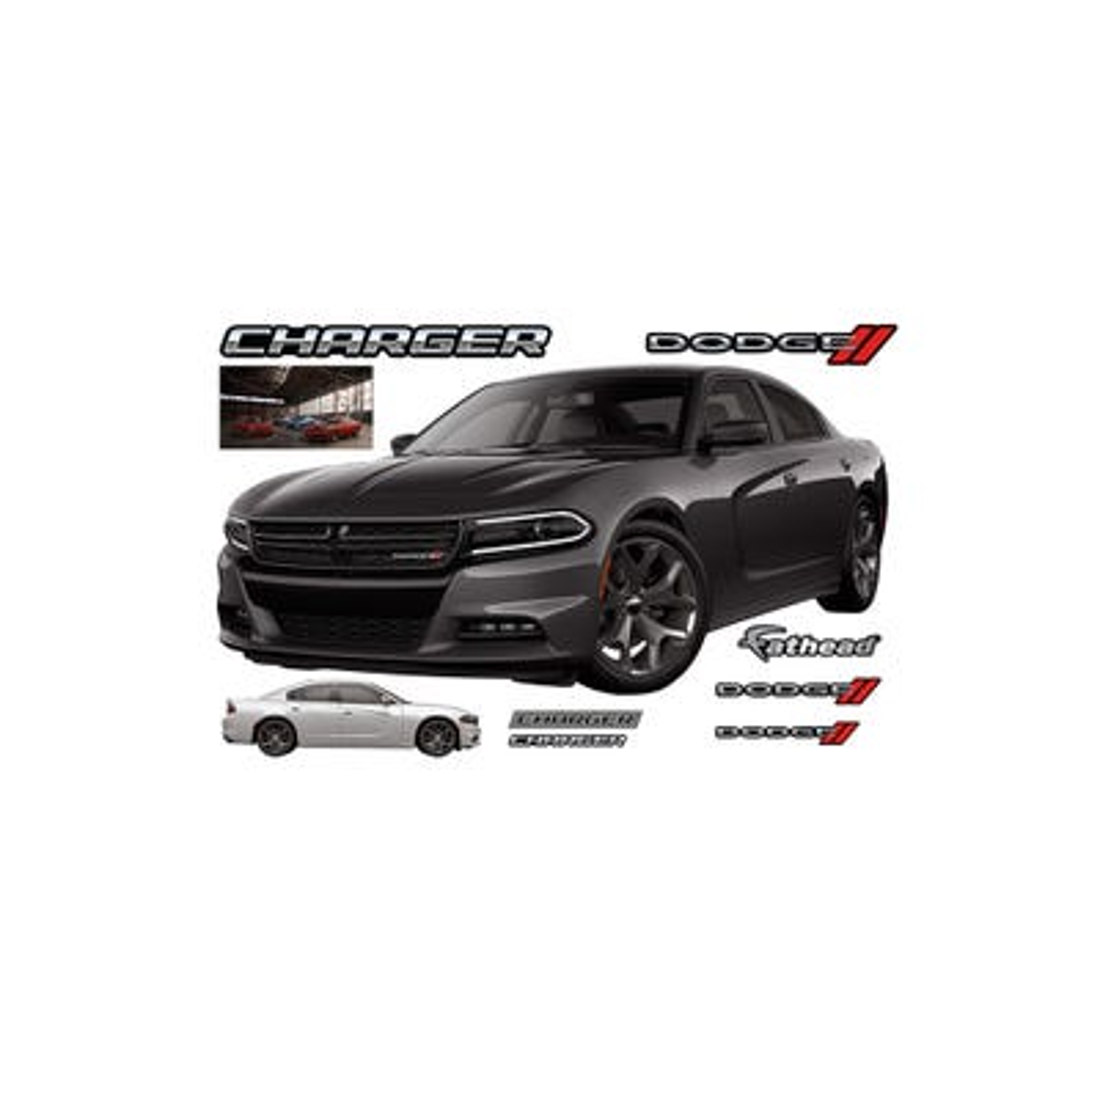 2015 Dodge Challenger SRT® Hellcat Fathead